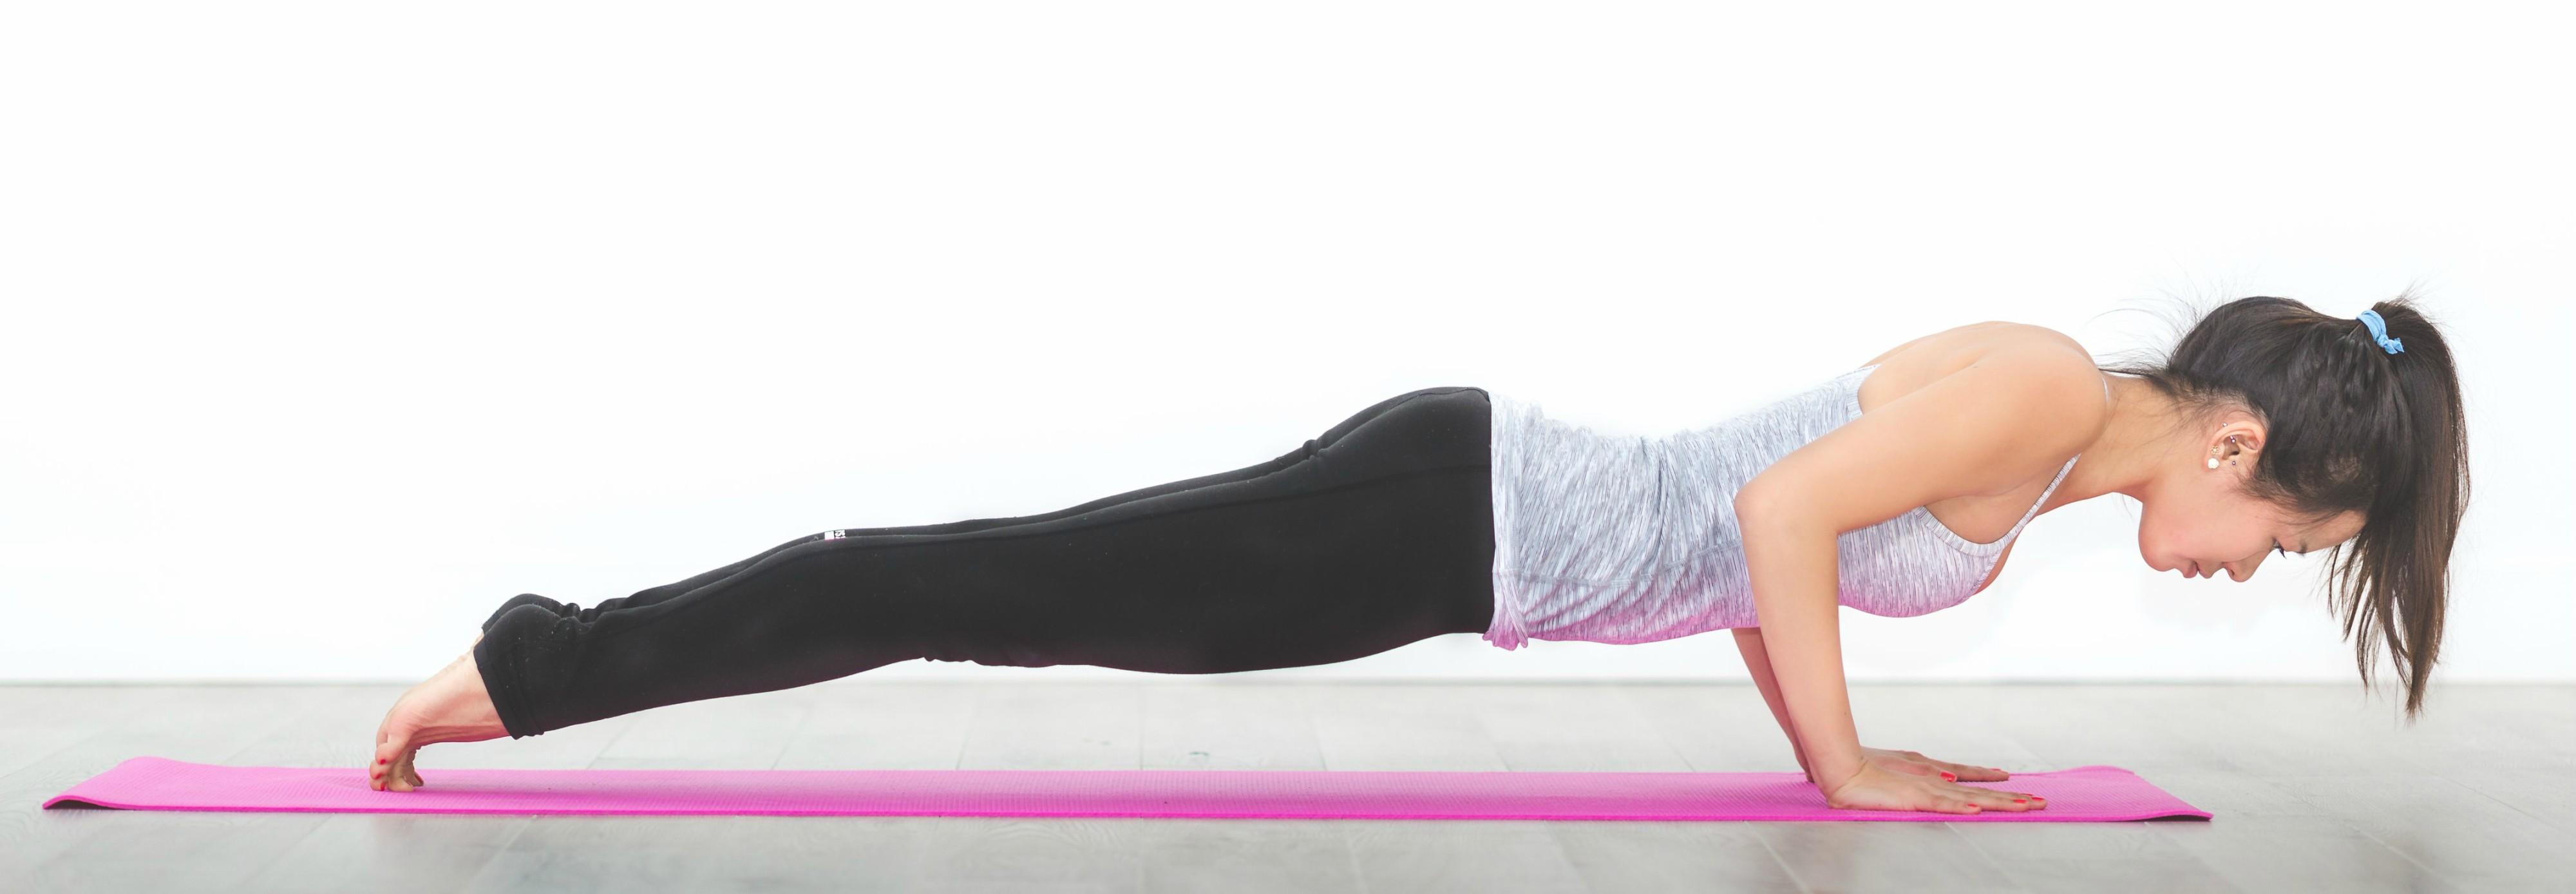 Image of yoga plank RunSmartOnline